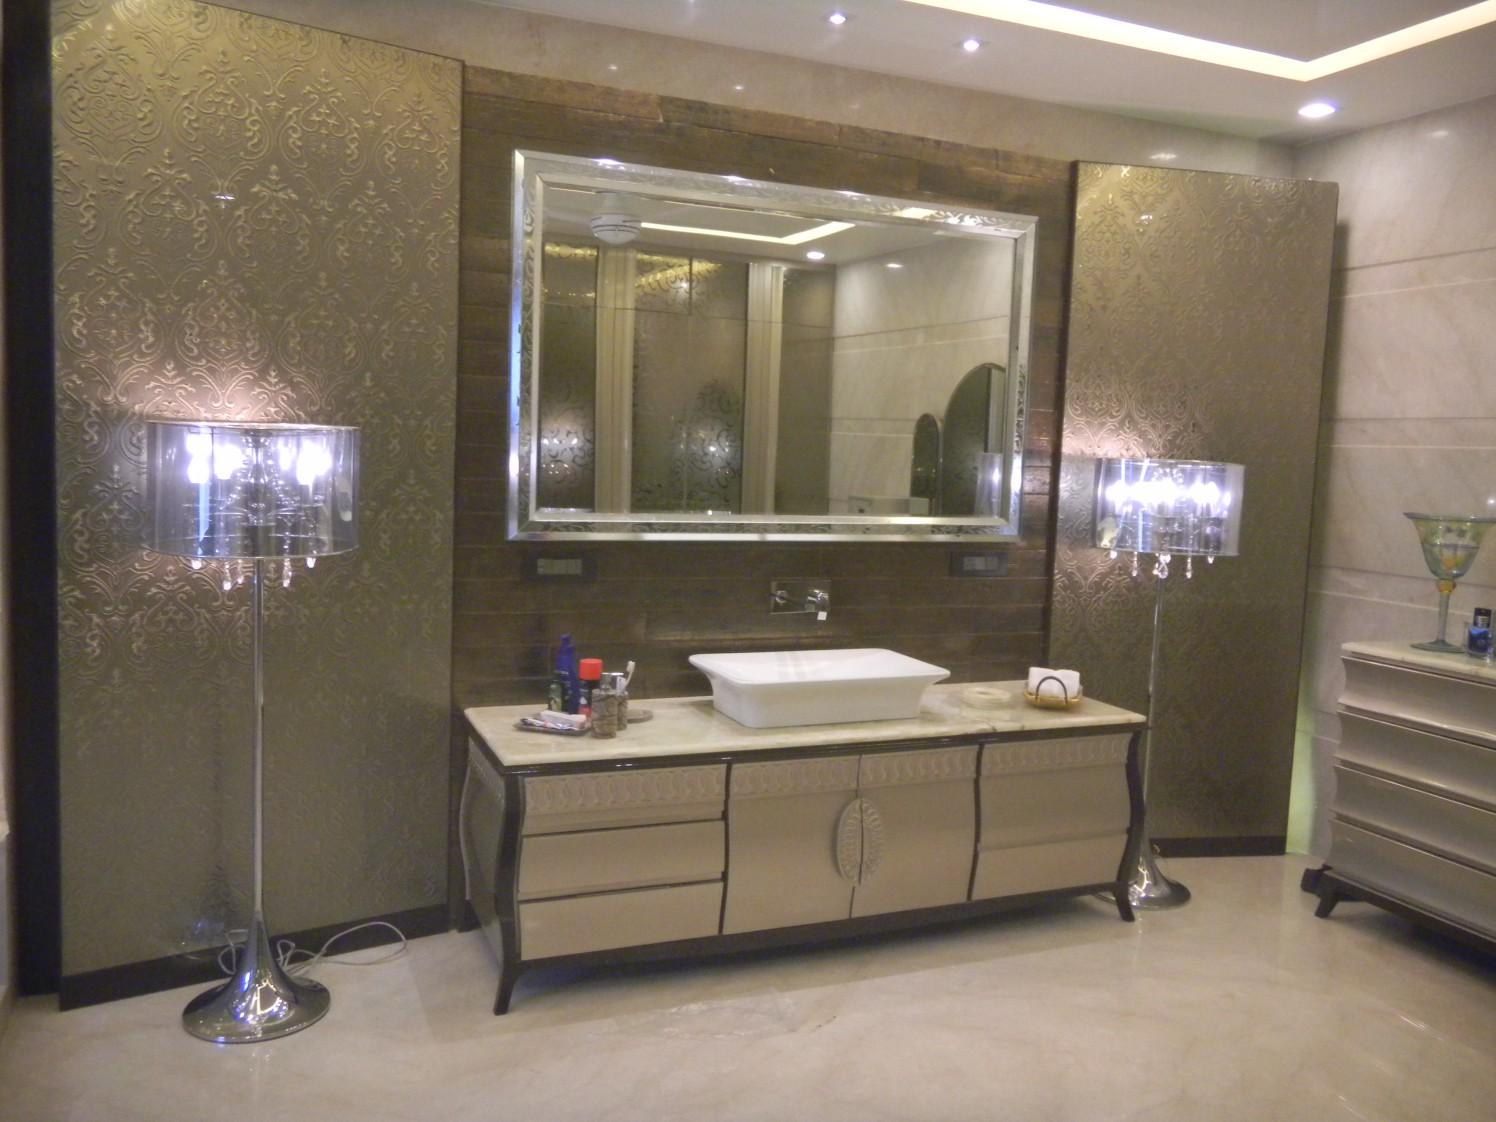 Modern Style Lamp In Bathroom by Khayati Bathroom Contemporary   Interior Design Photos & Ideas